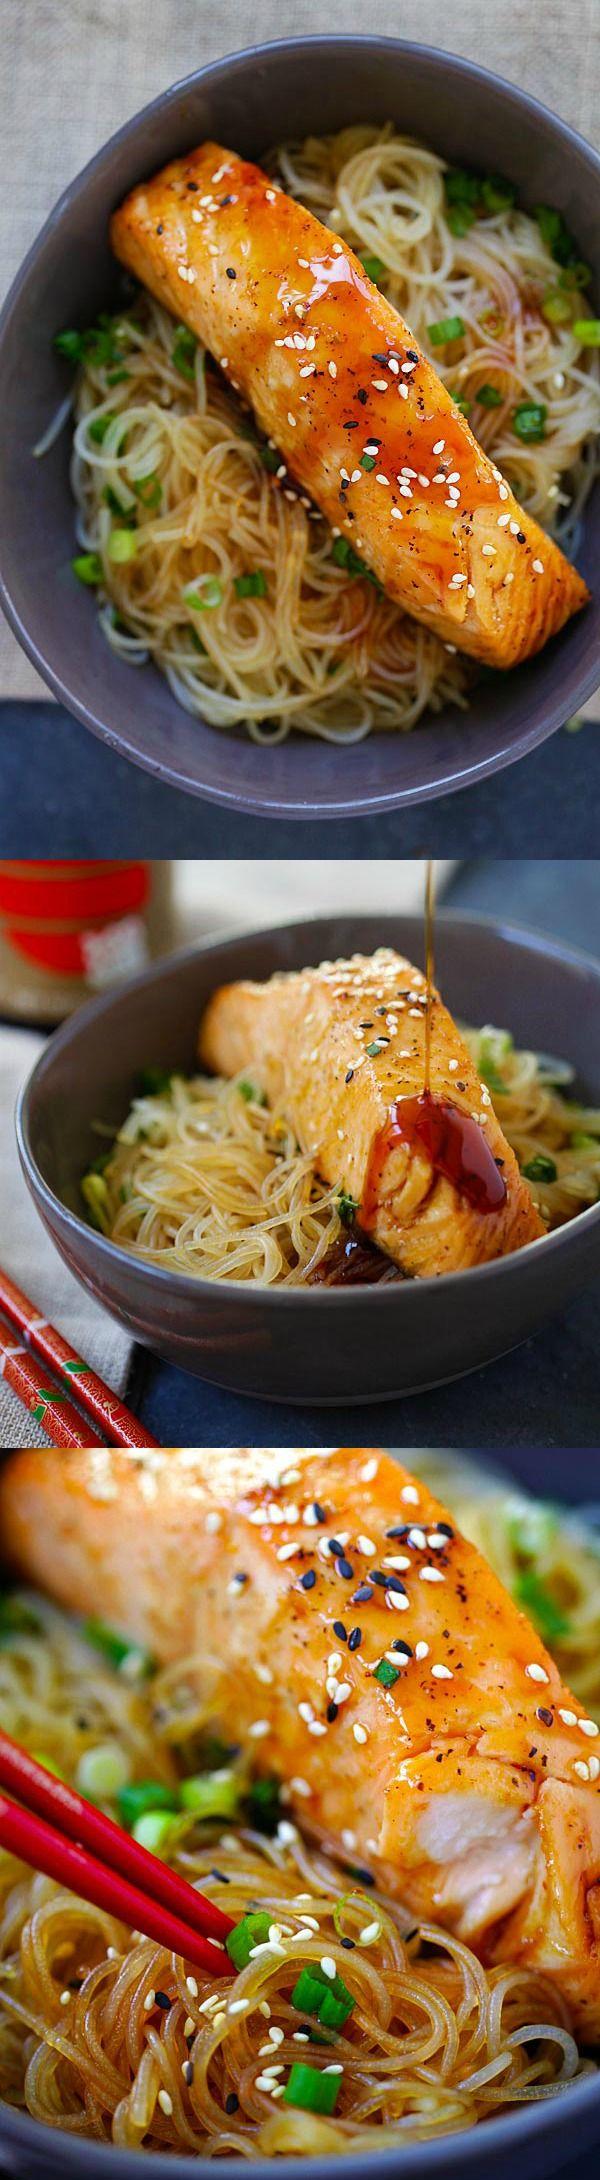 Salmon Teriyaki Noodles – moist and juicy salmon and rice noodles made with San-J Tamari. Gluten-free, healthy family weeknight dinner | rasamalaysia.com